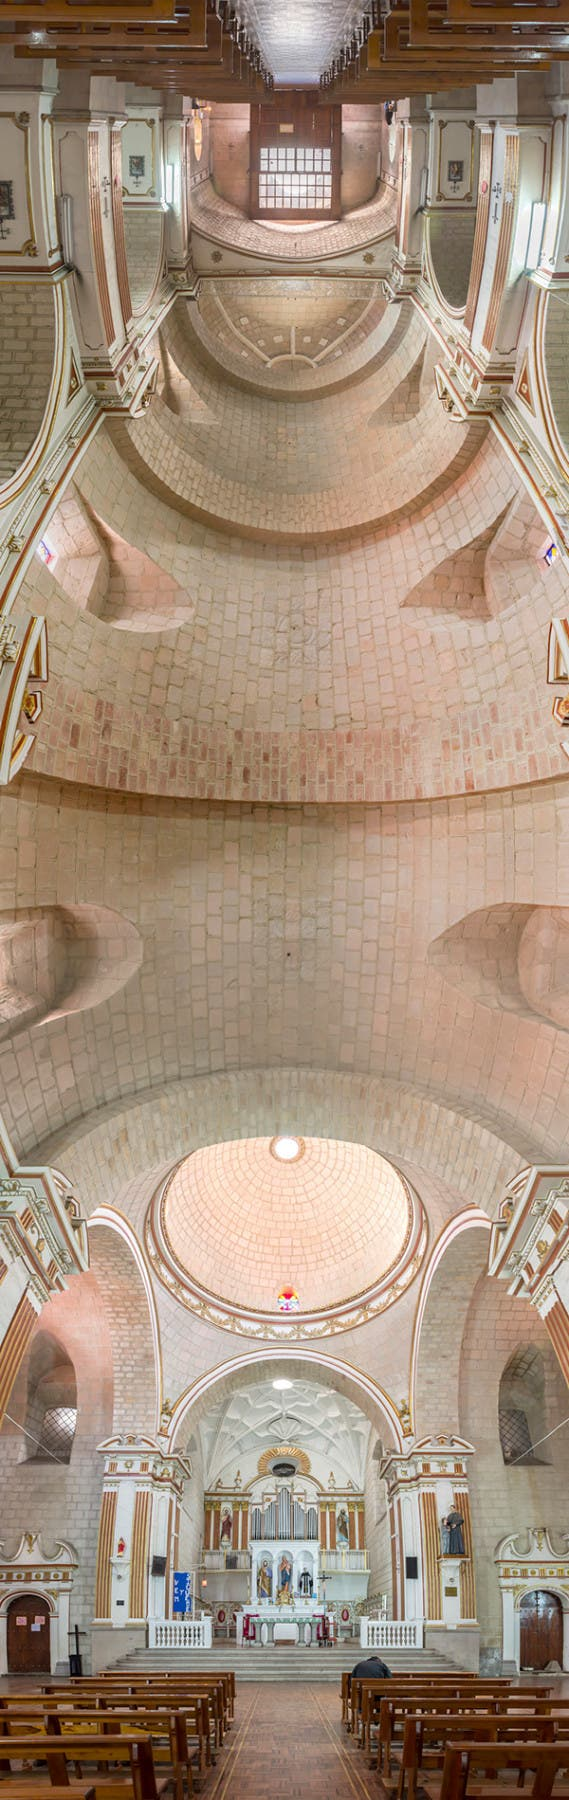 techos-de-iglesias-10